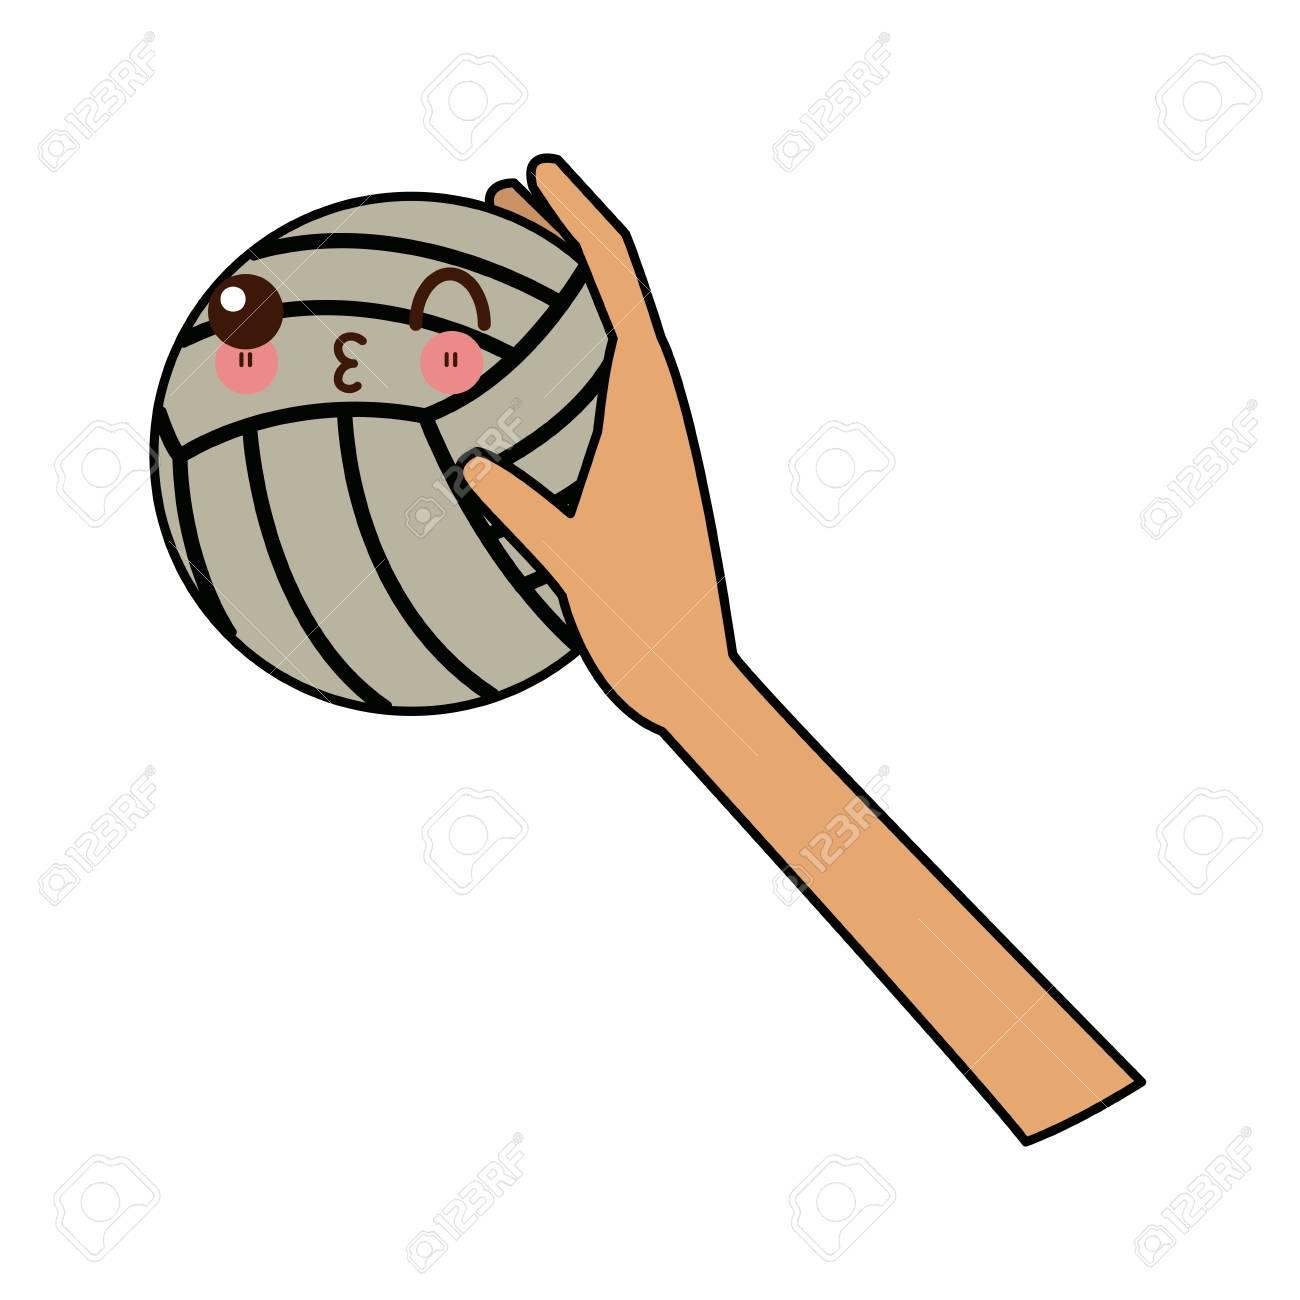 Kawaii Main Tenant Ballon De Volley Ball Sport Dessin Animé Illustration Vectorielle